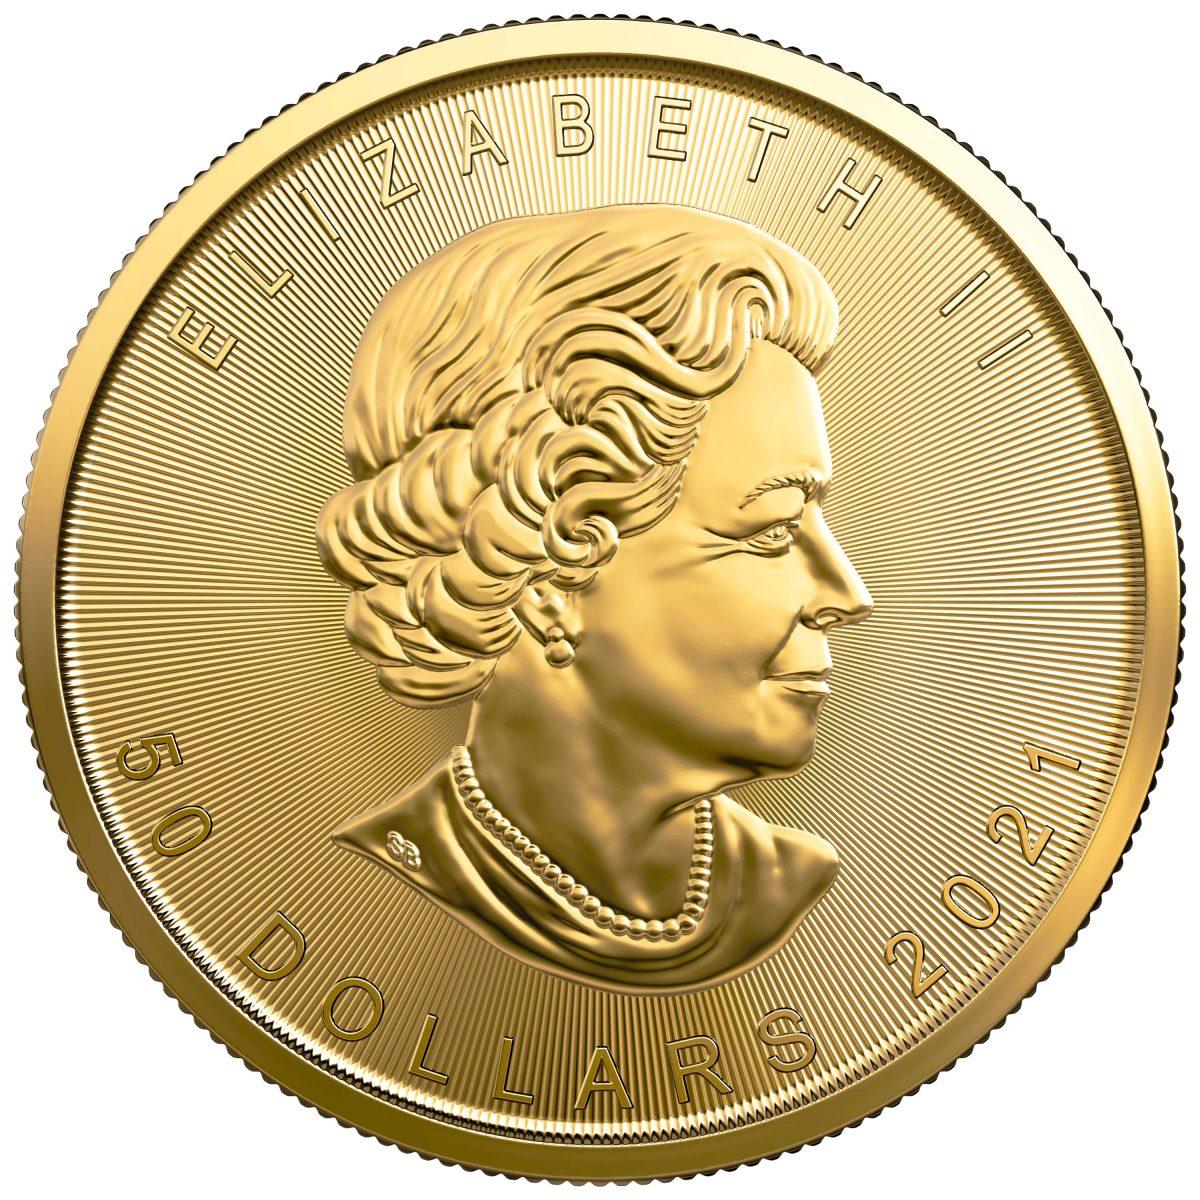 2021 Canadian Maple Leaf 1oz Coin .9999